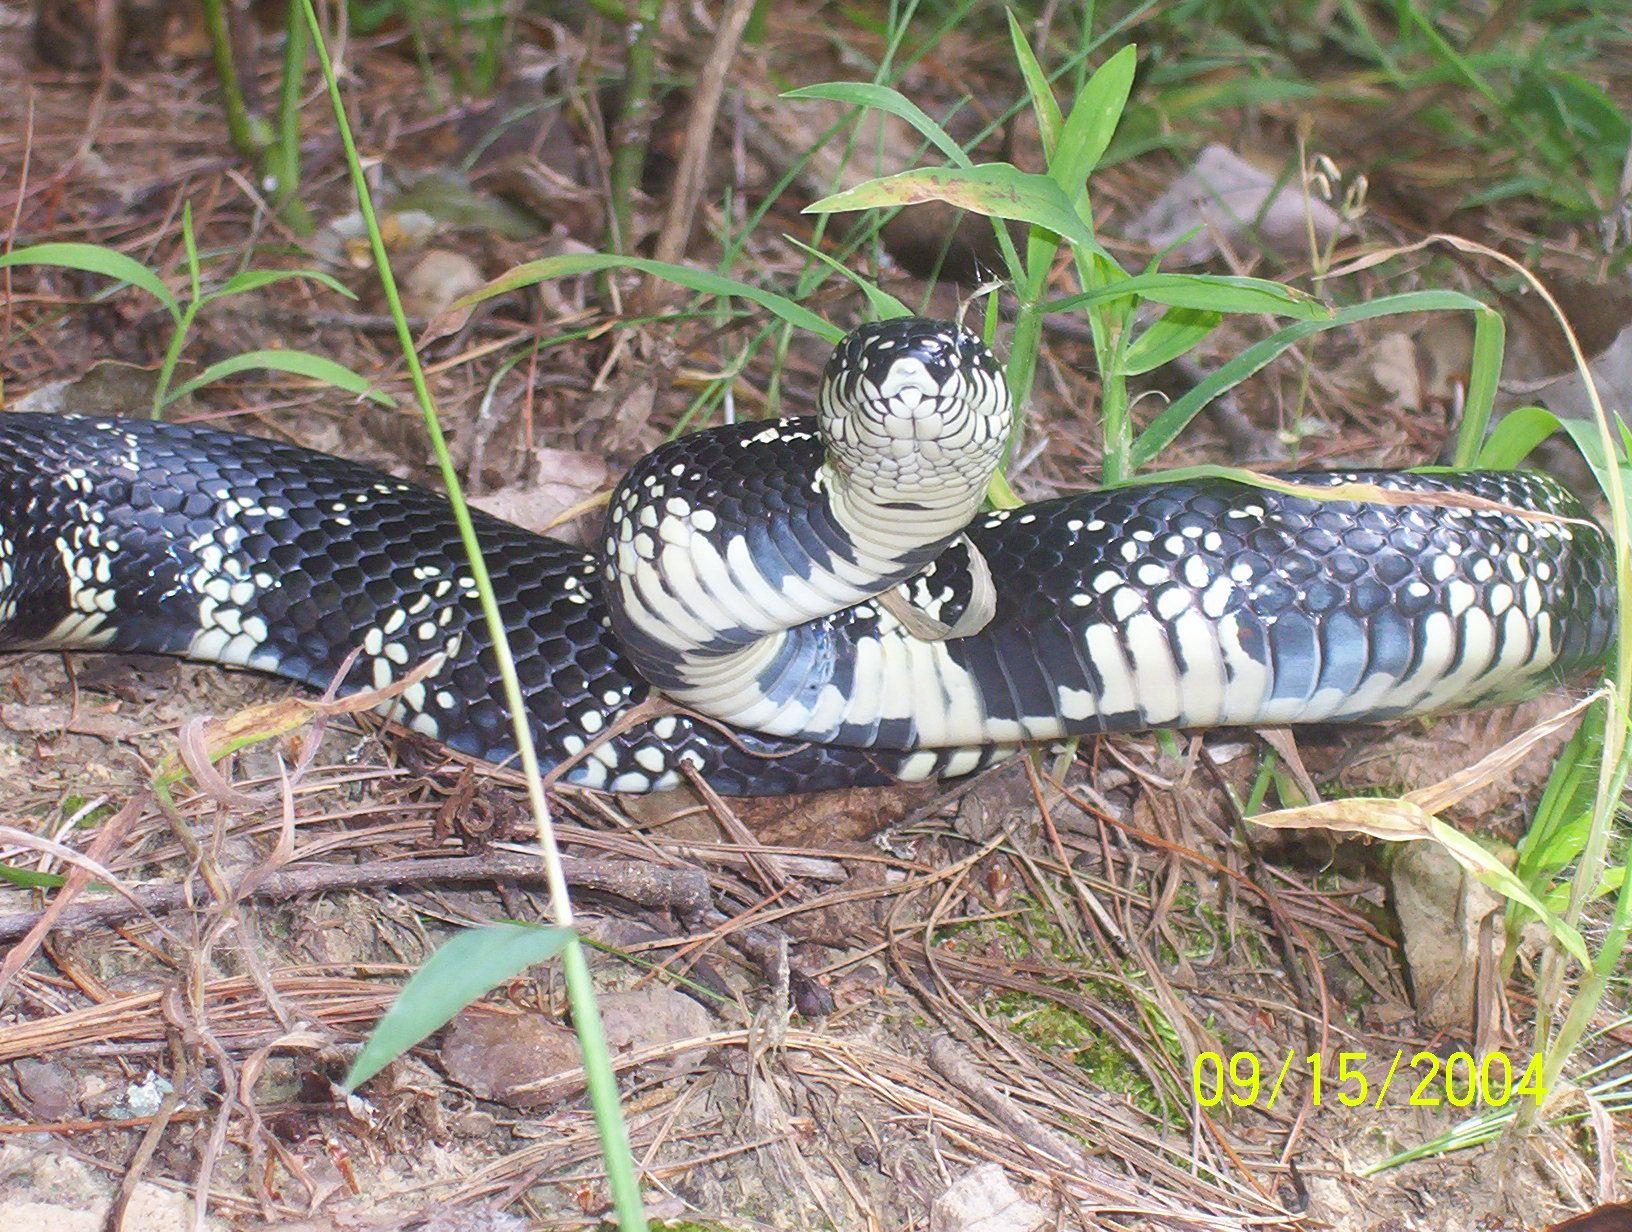 Snakes Of Georgia Snake Aquaponics Kit Black Garden